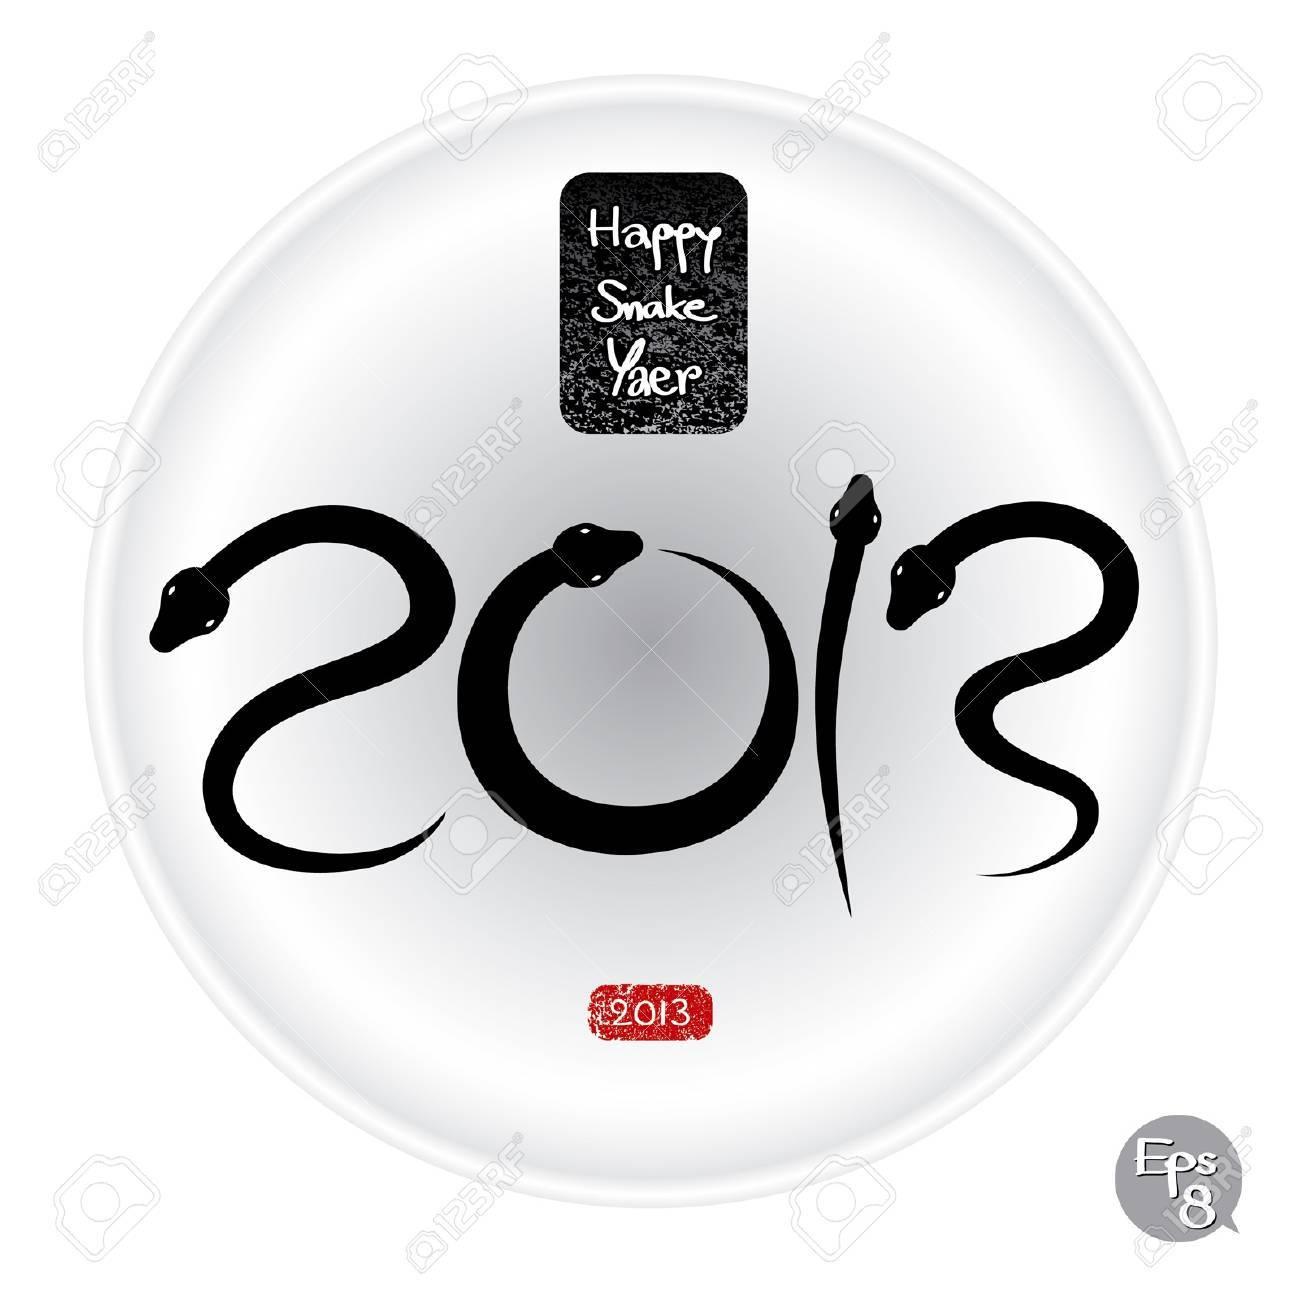 happy snake year 2013 Stock Vector - 15528496